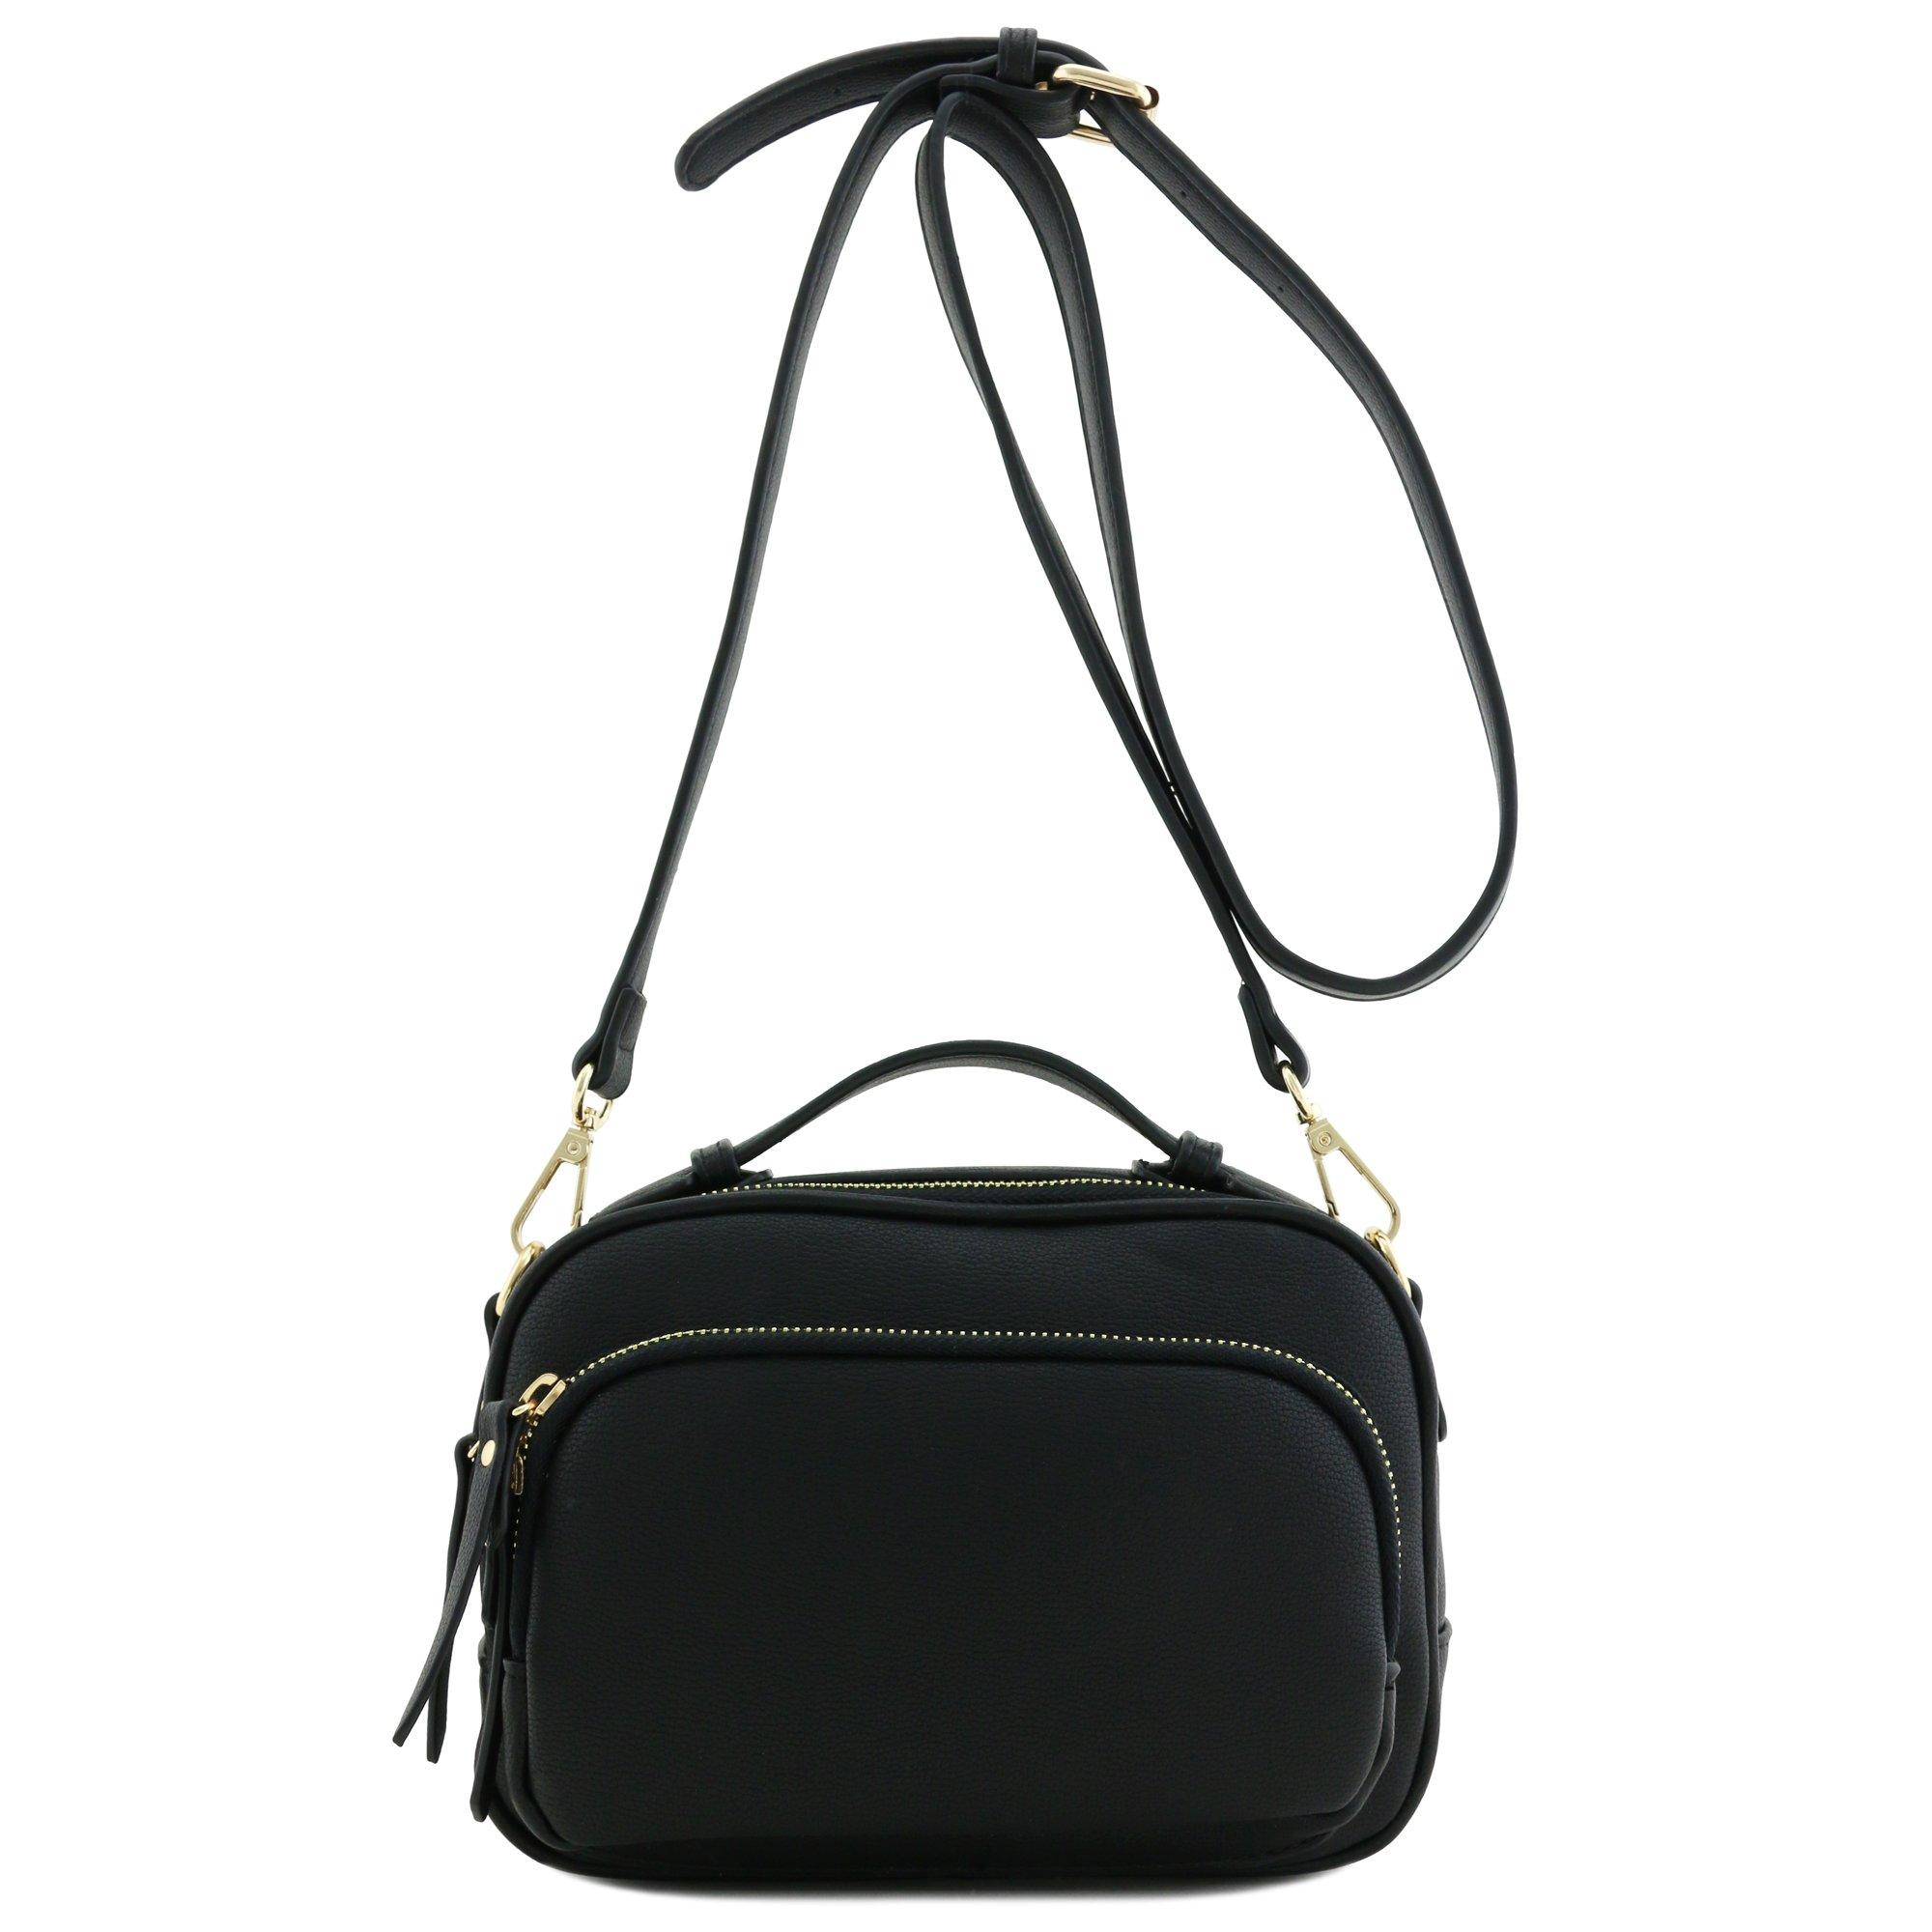 Top Handle Mini Tote Bag Crossbody Purse Black